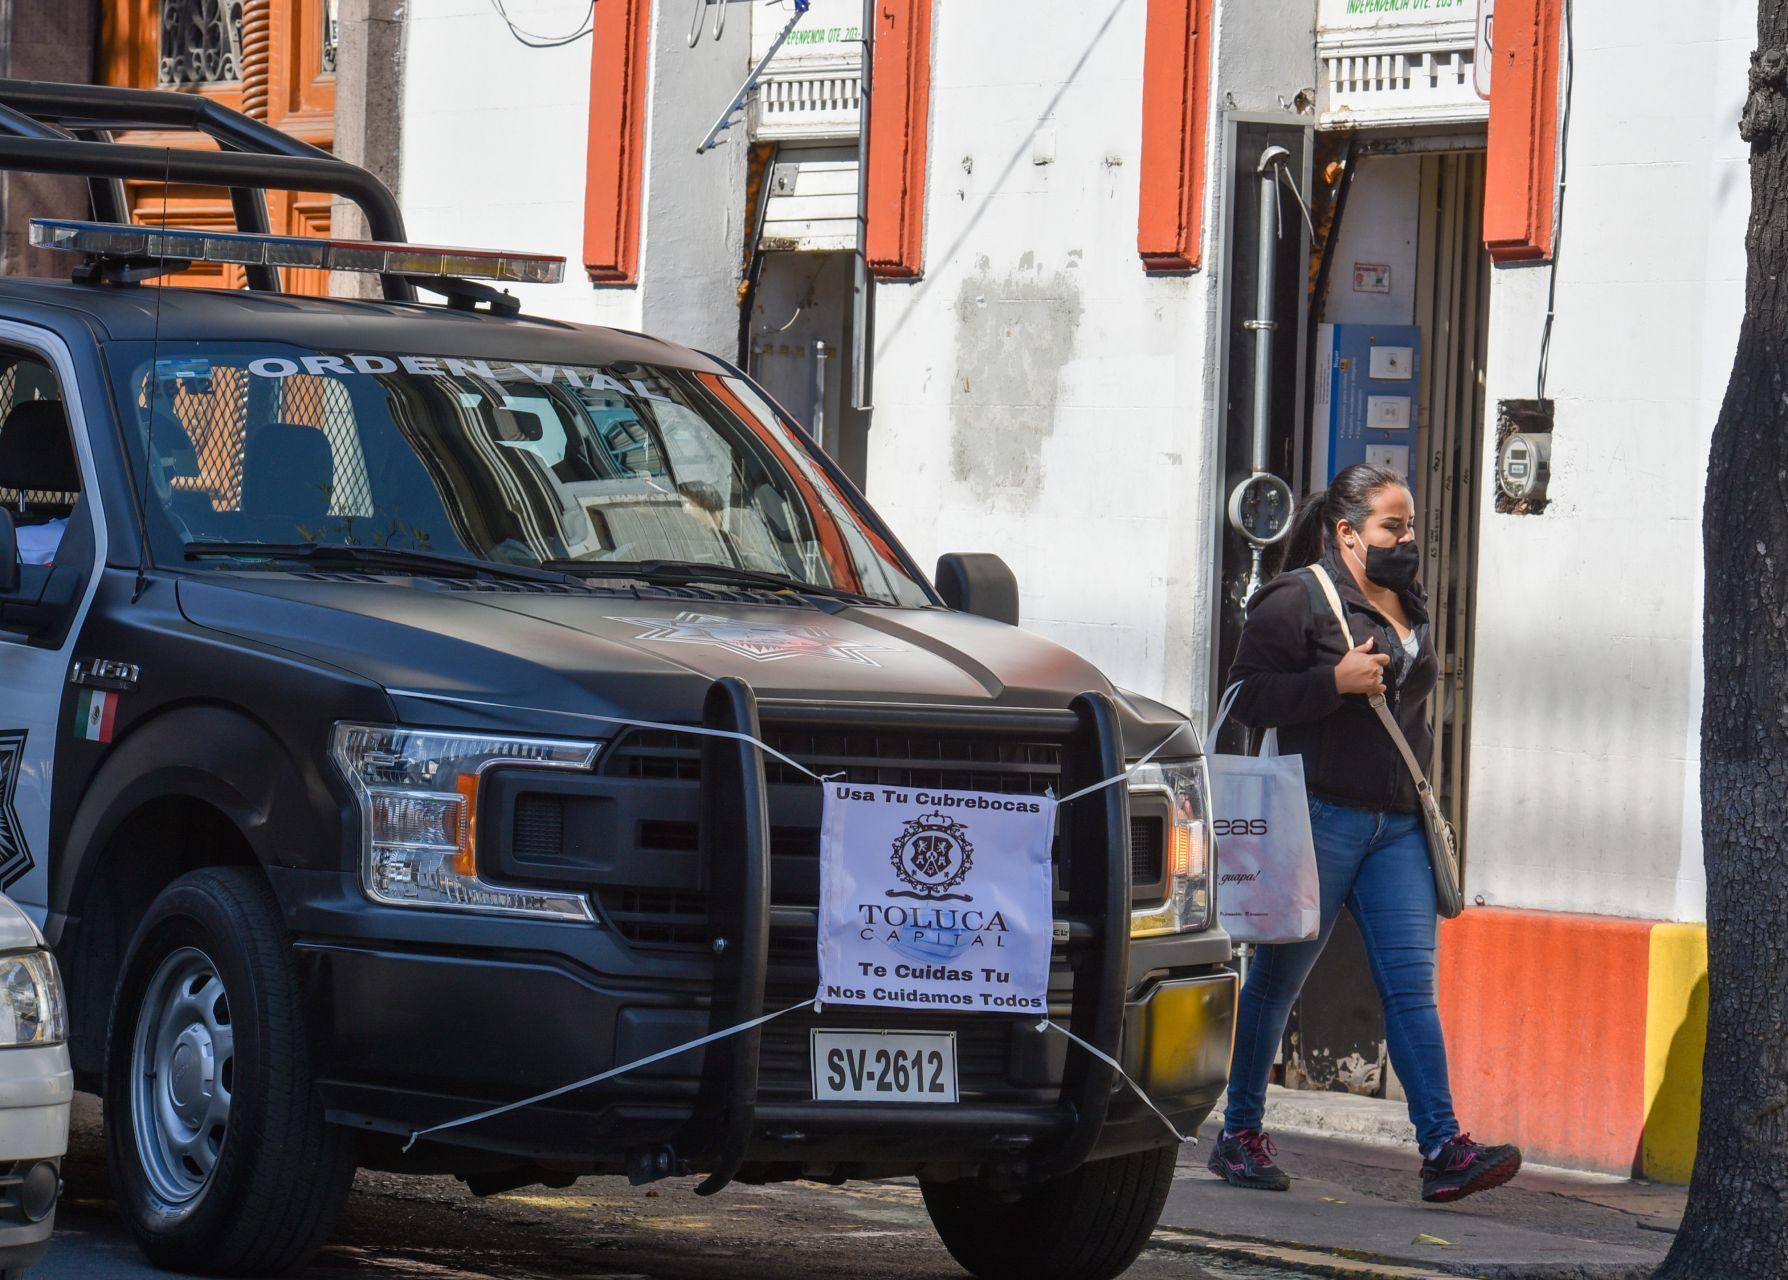 Patrullas con cubrebocas en Toluca